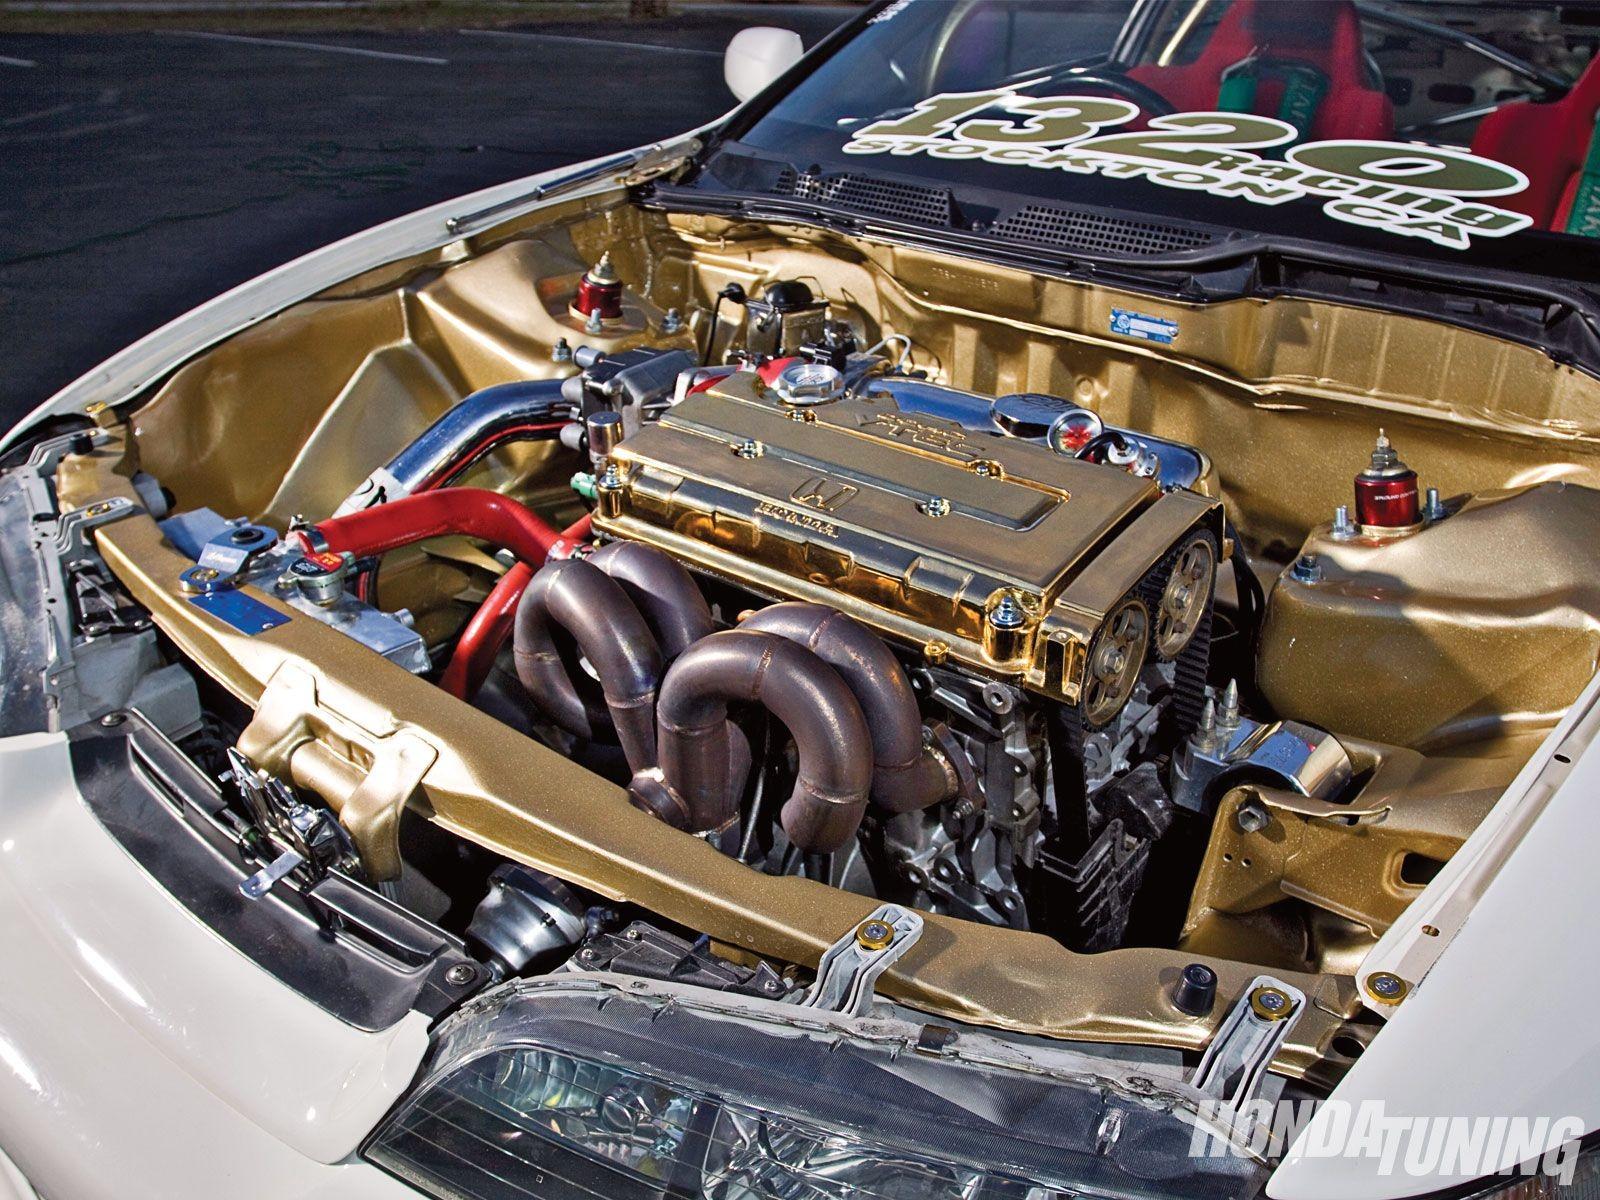 95 Acura Integra Engine Diagram 1994 Acura Integra Ls the Transformer & Image Gallery Of 95 Acura Integra Engine Diagram